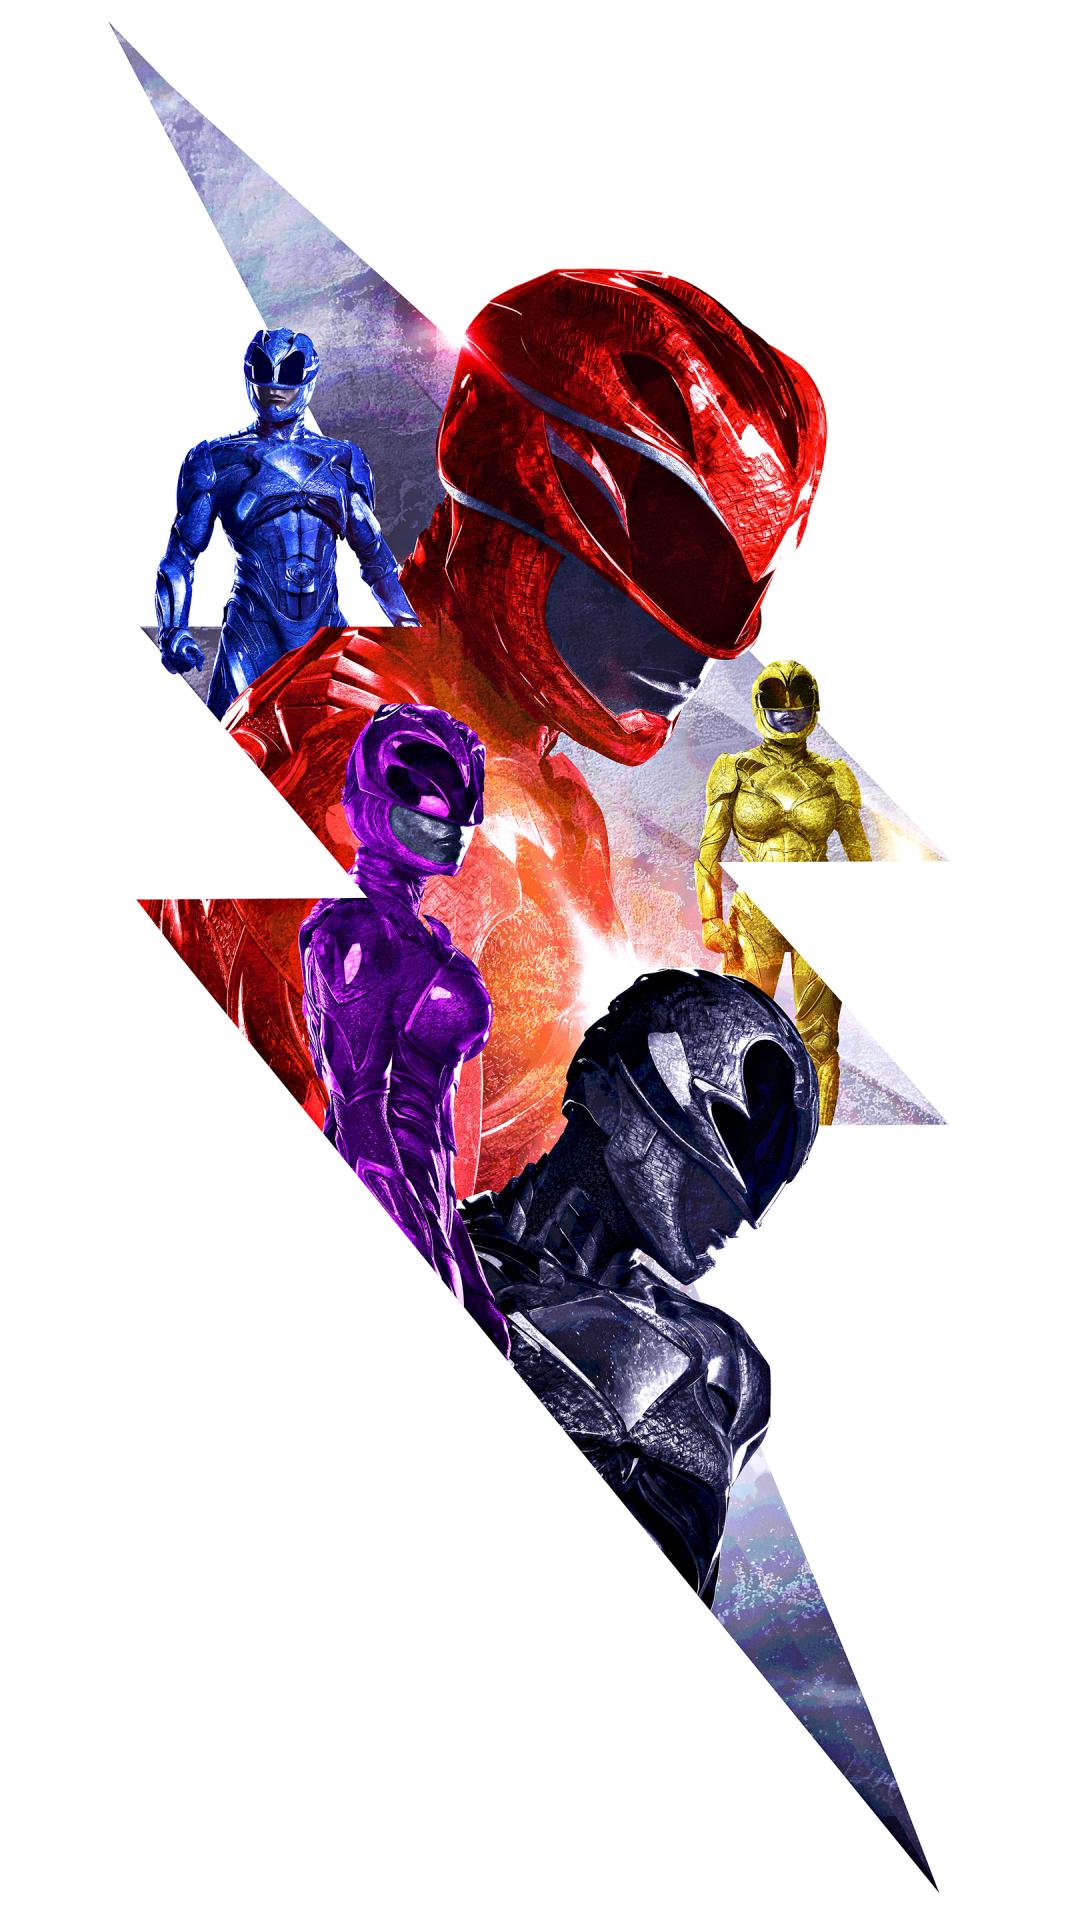 MoviePower Rangers 2017 1080x1920 Wallpaper ID 670634 1080x1920